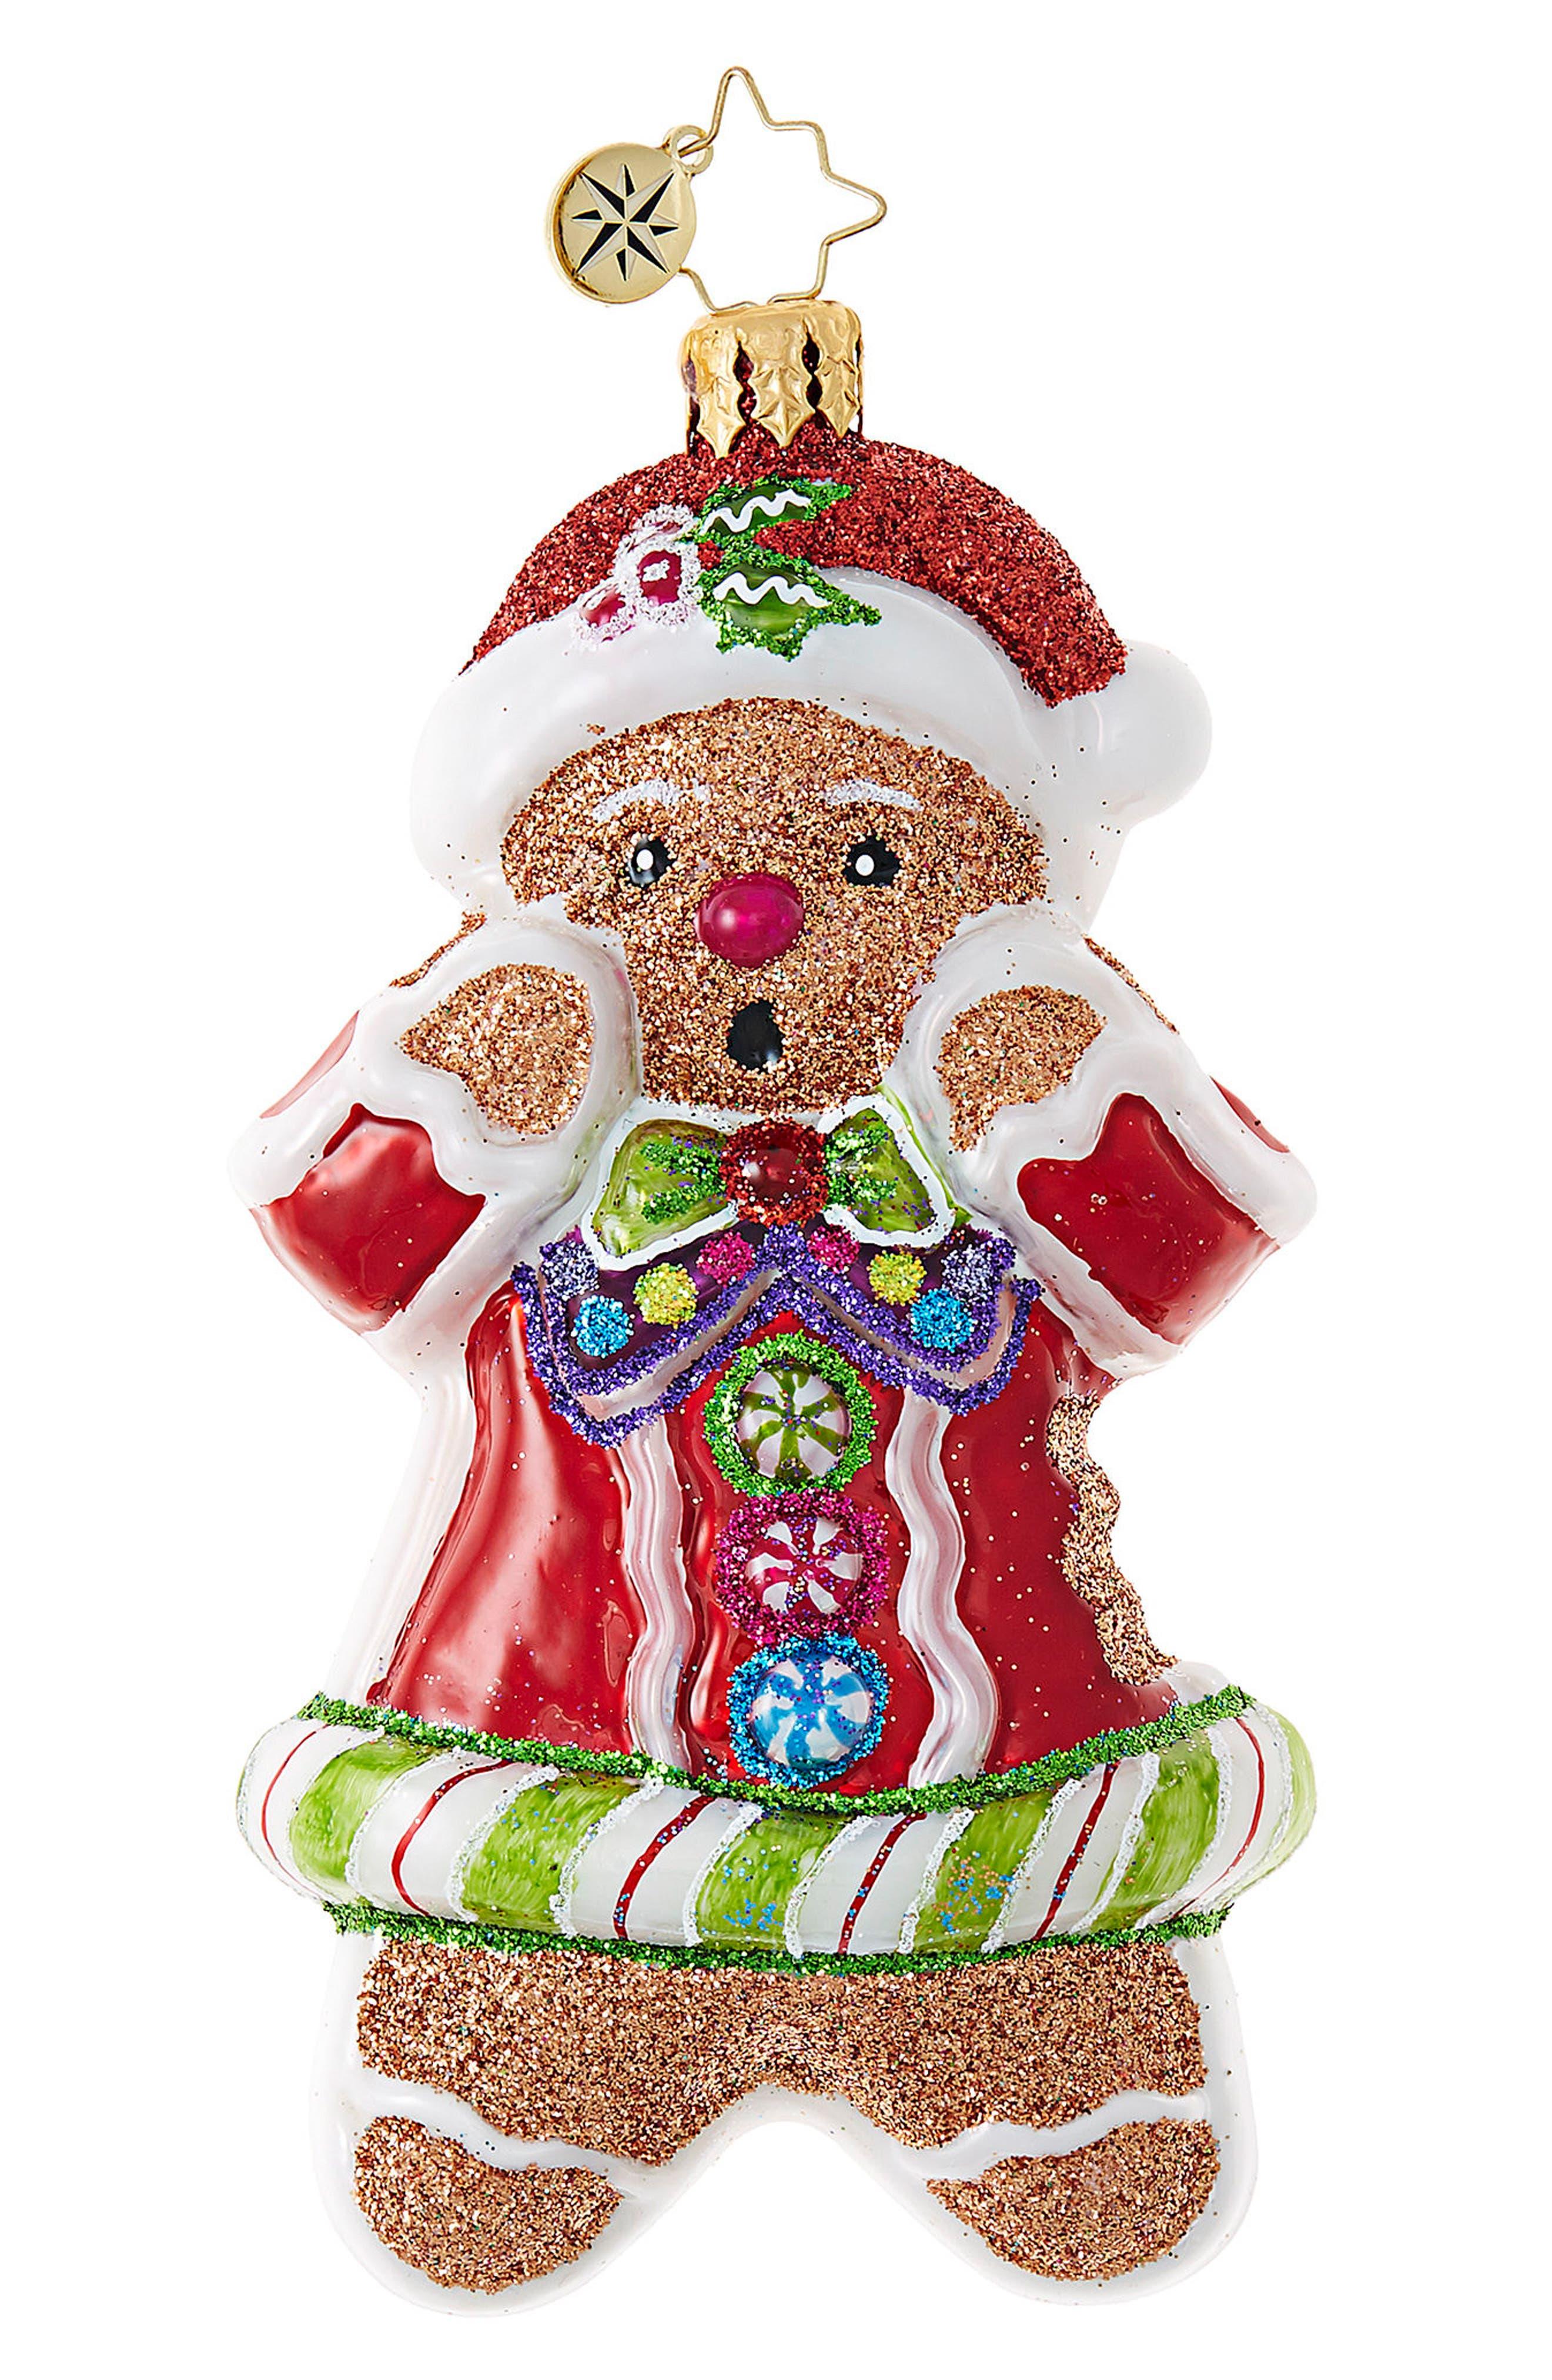 Just One Bite Gingerbread Man Santa Claus Ornament,                         Main,                         color, 600